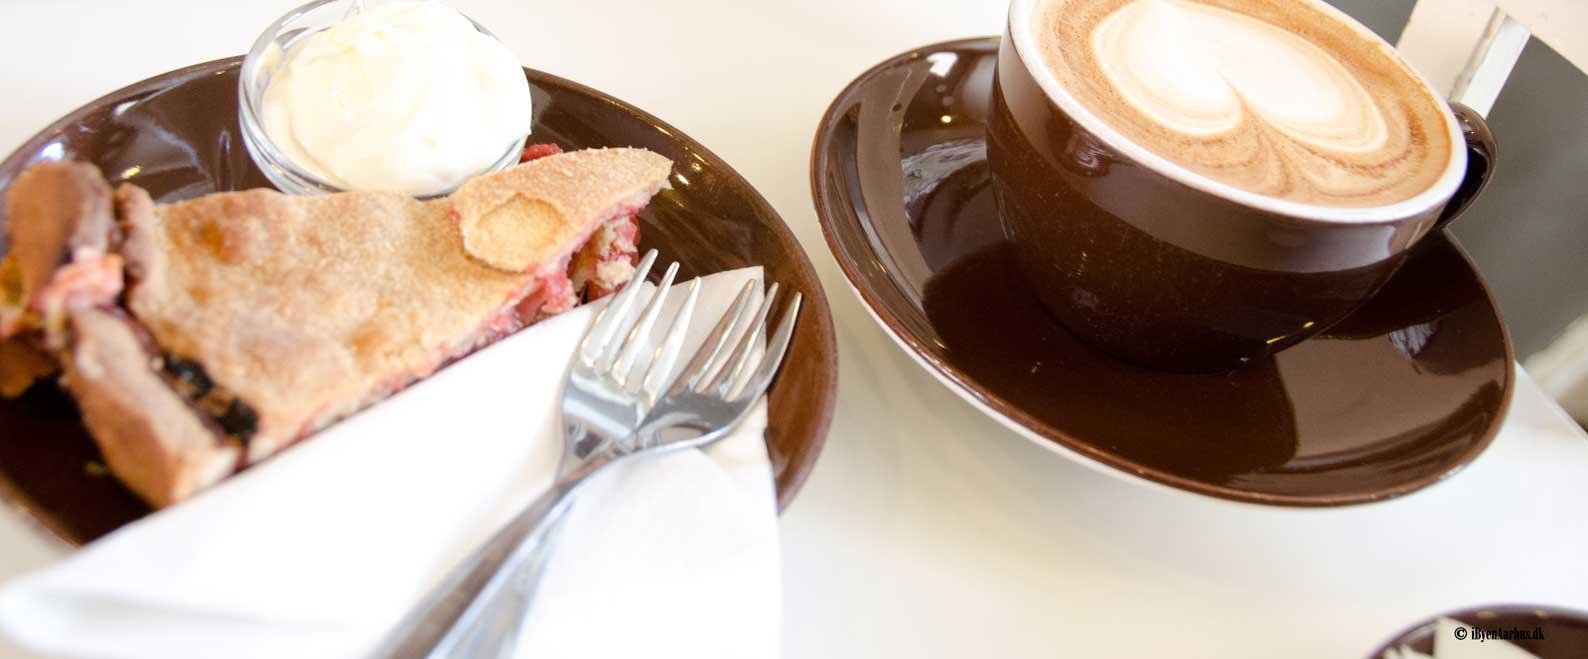 Sigfreds Kaffebar